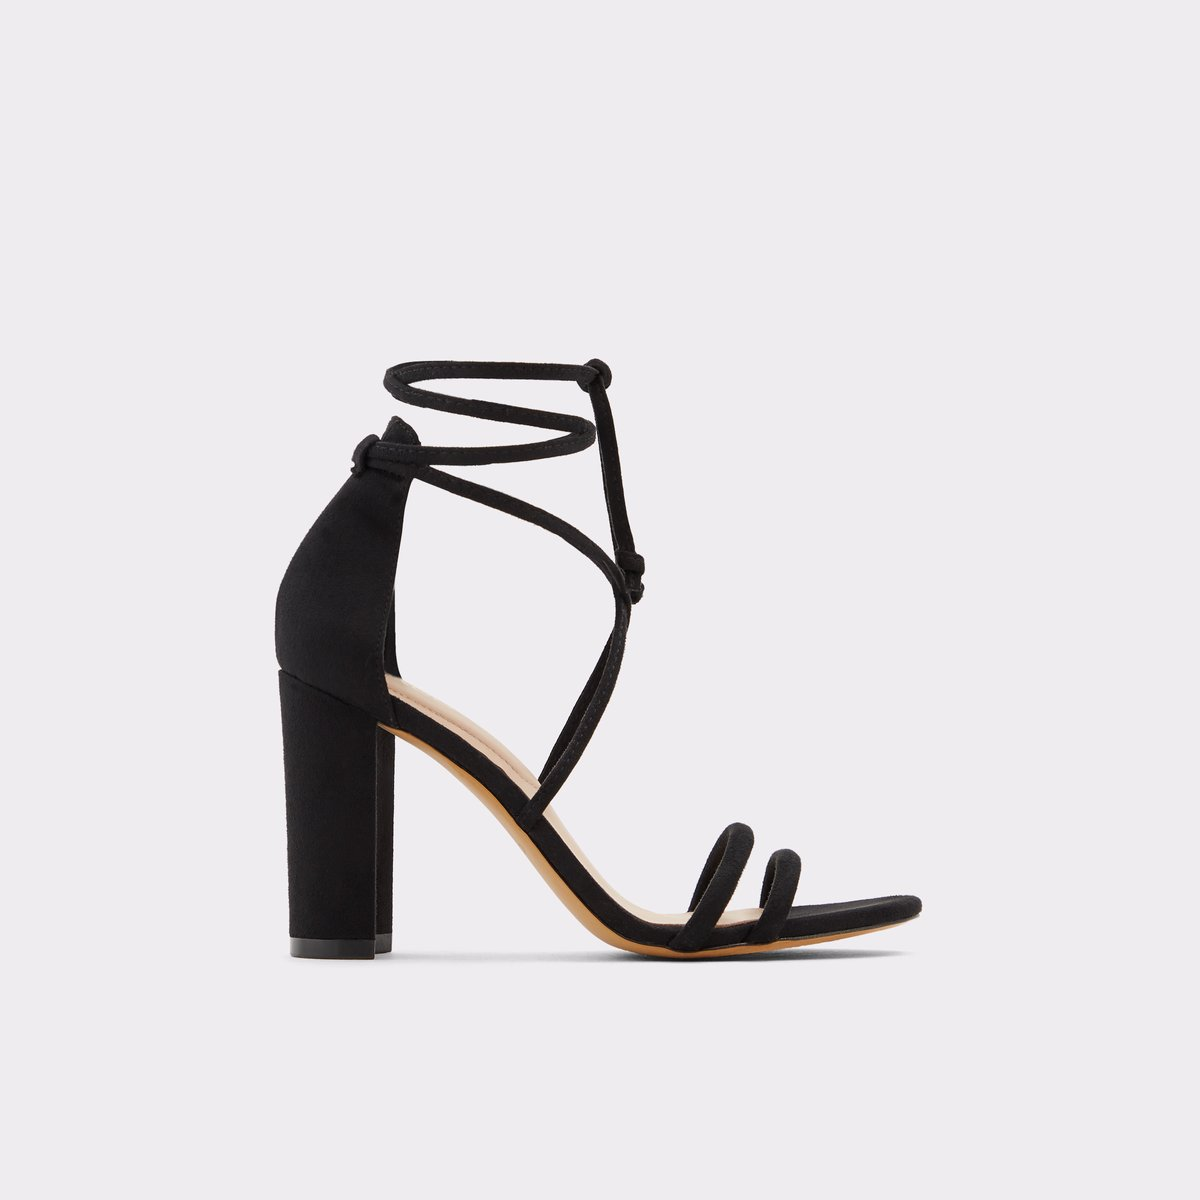 Nyderia Black Women's Sandals   ALDO US